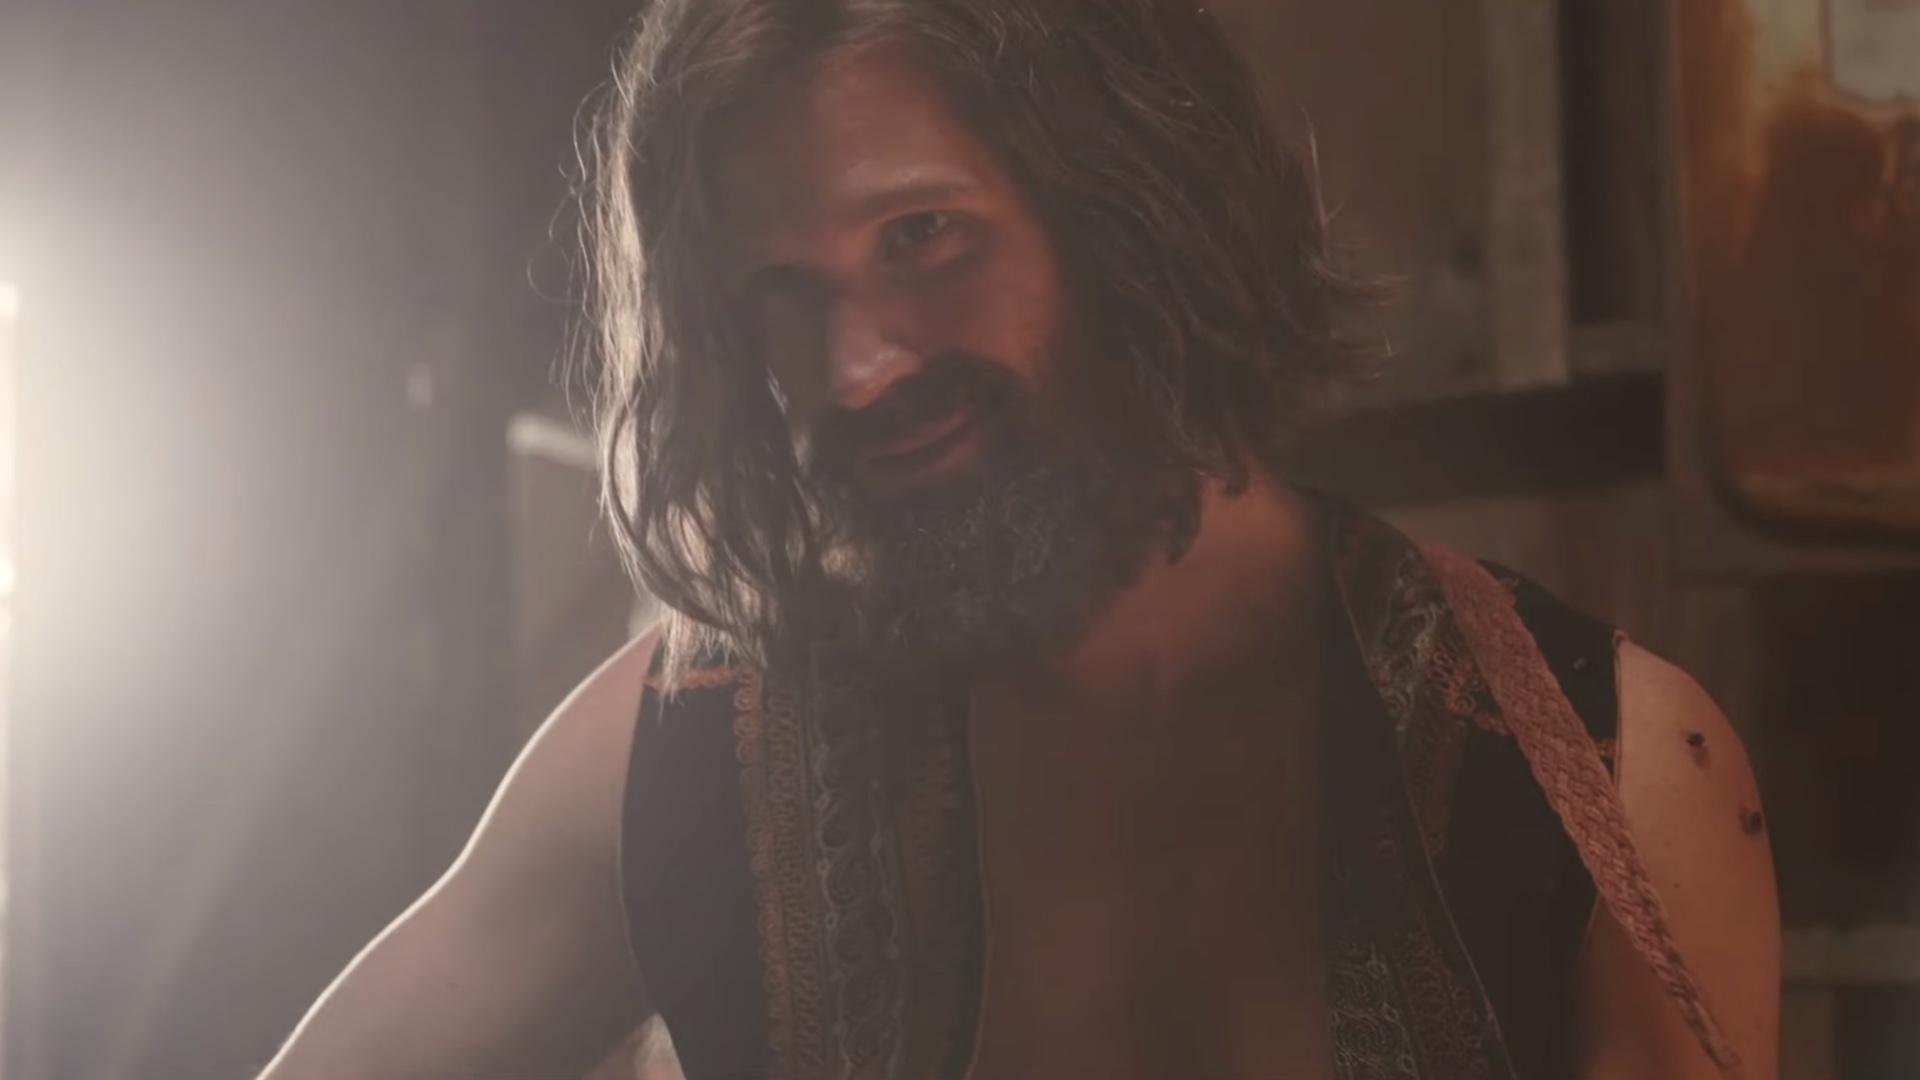 First Trailer For Matt Smith's Charles Manson Movie CHARLIE